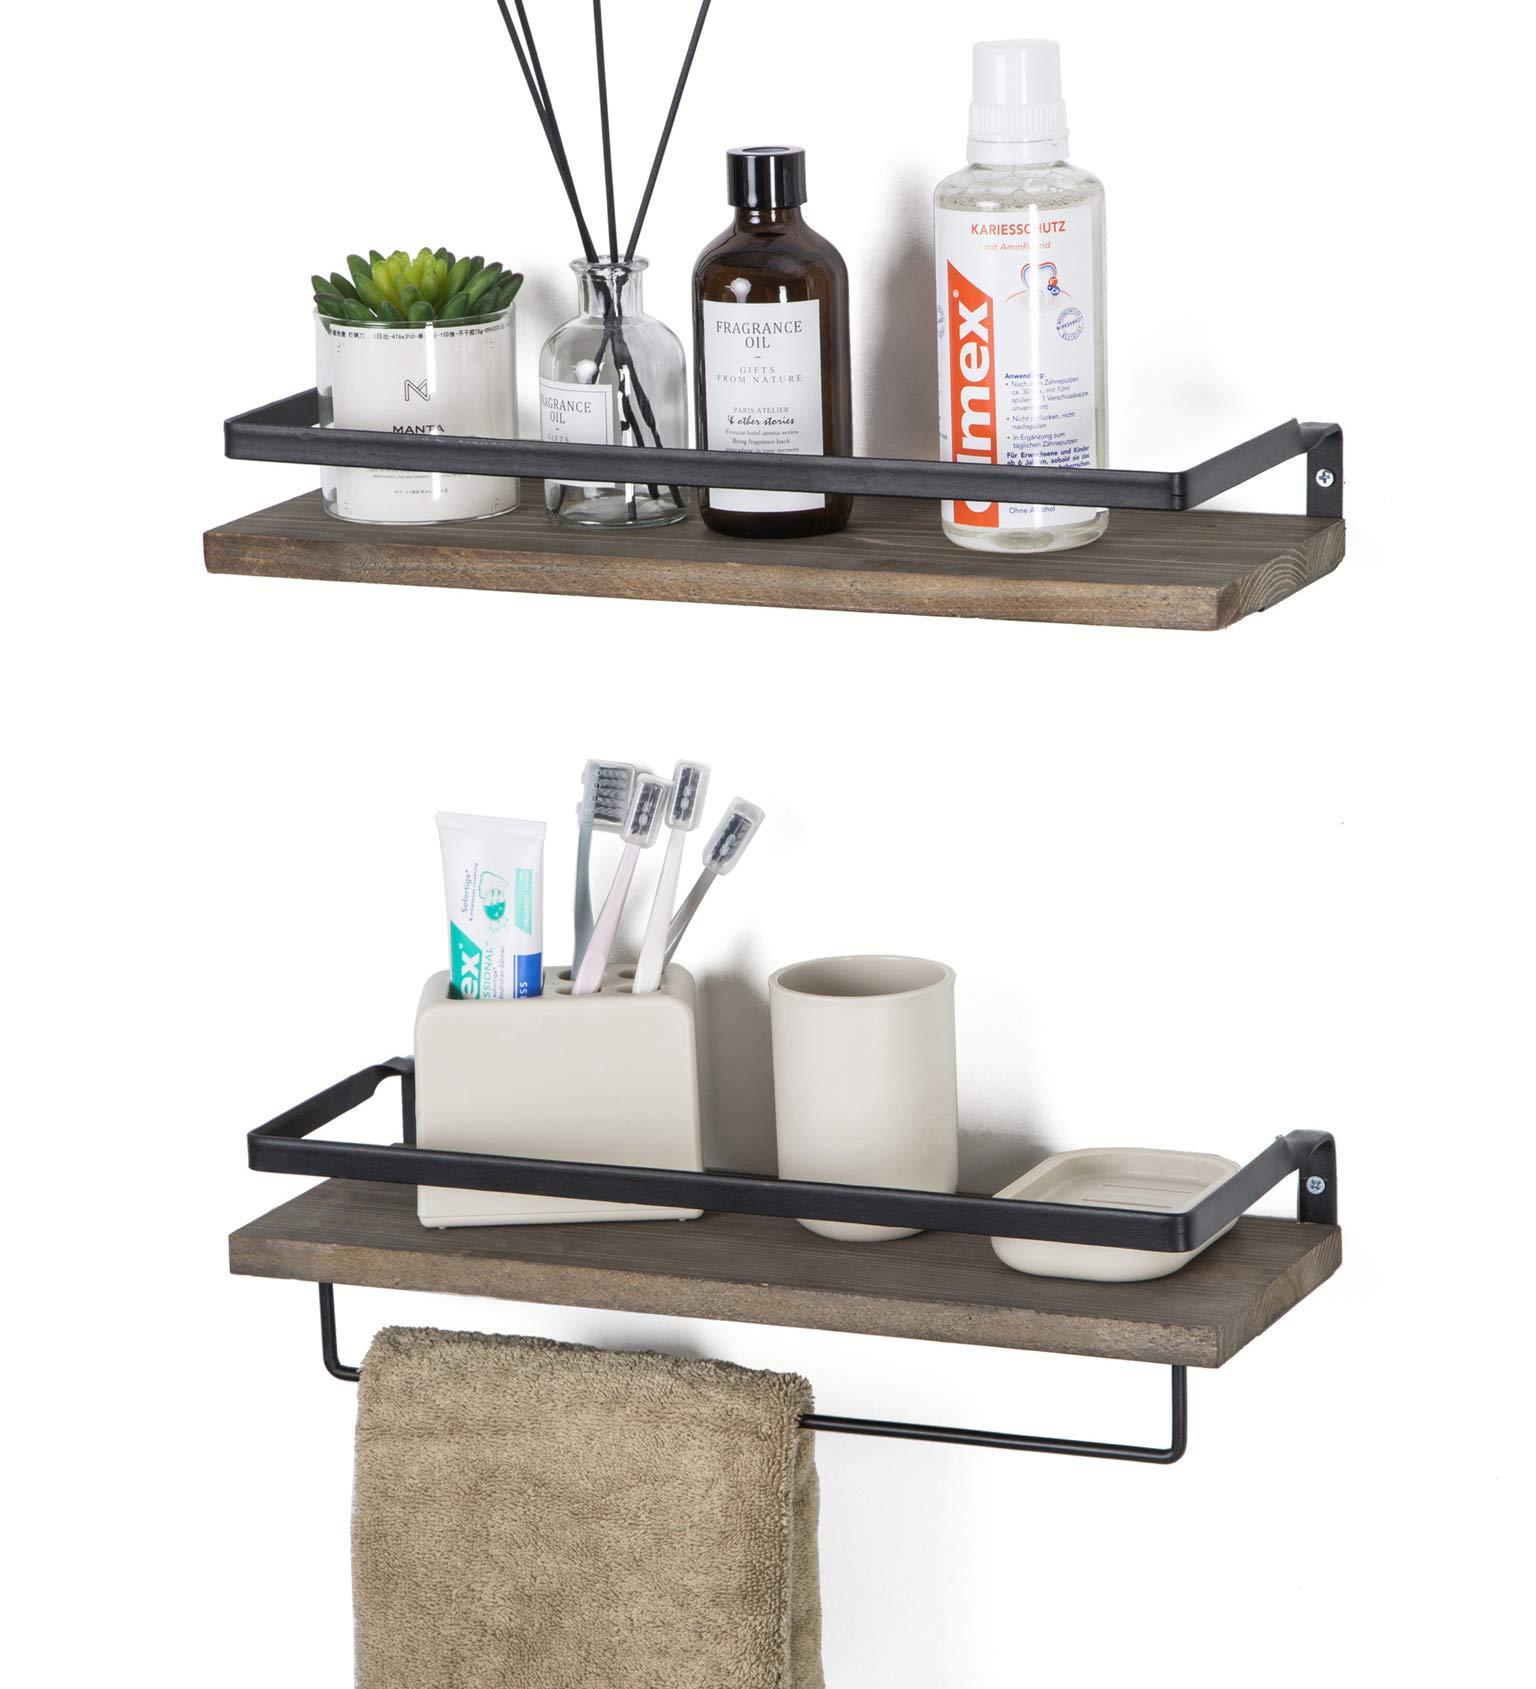 SODUKU Floating Shelves Wall Mounted Storage Shelves for Kitchen, Bathroom,Set of 2 Brown by SODUKU